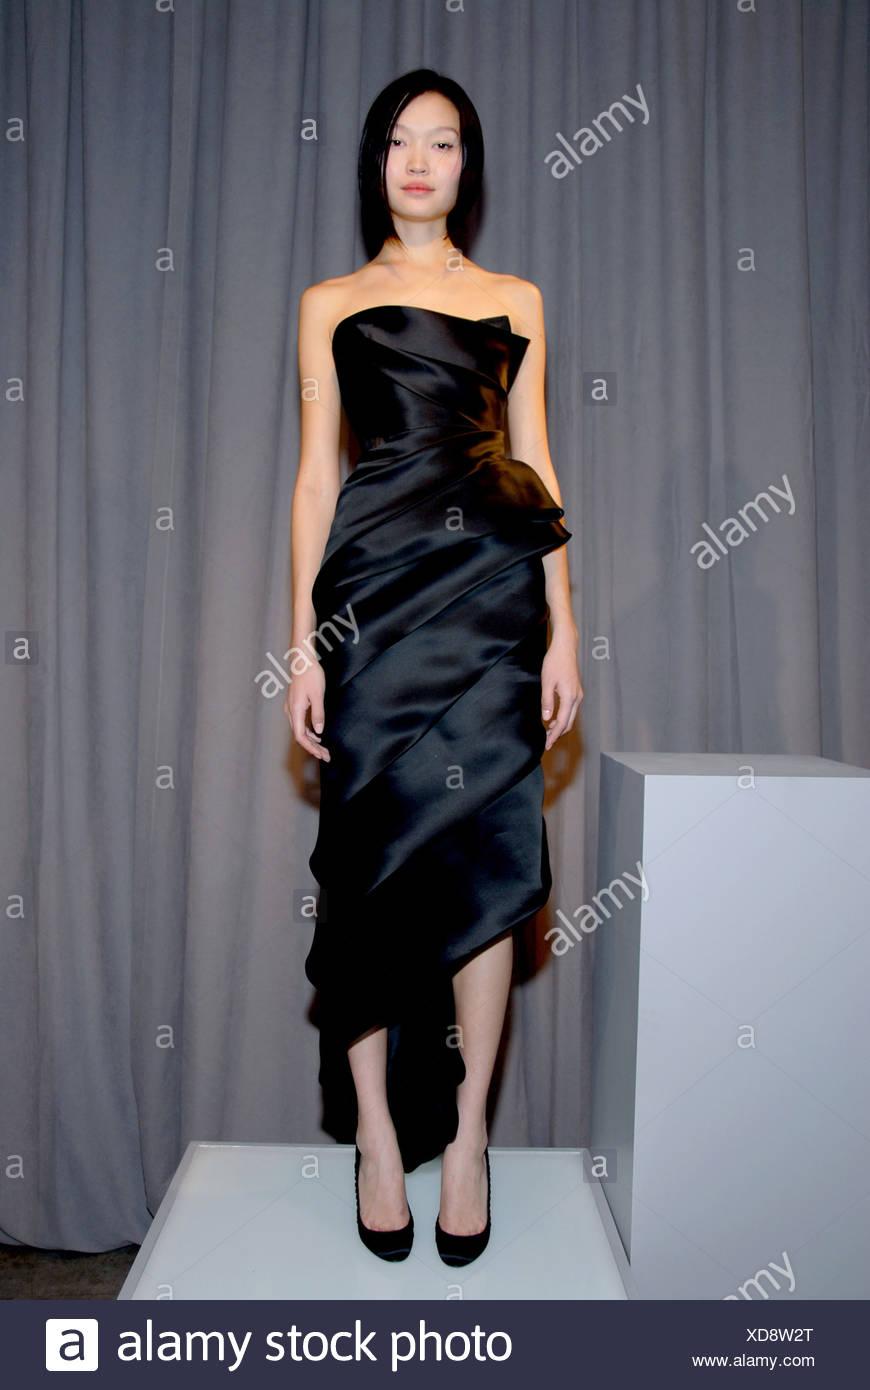 Strapless Black Evening Gown Stock Photos & Strapless Black Evening ...